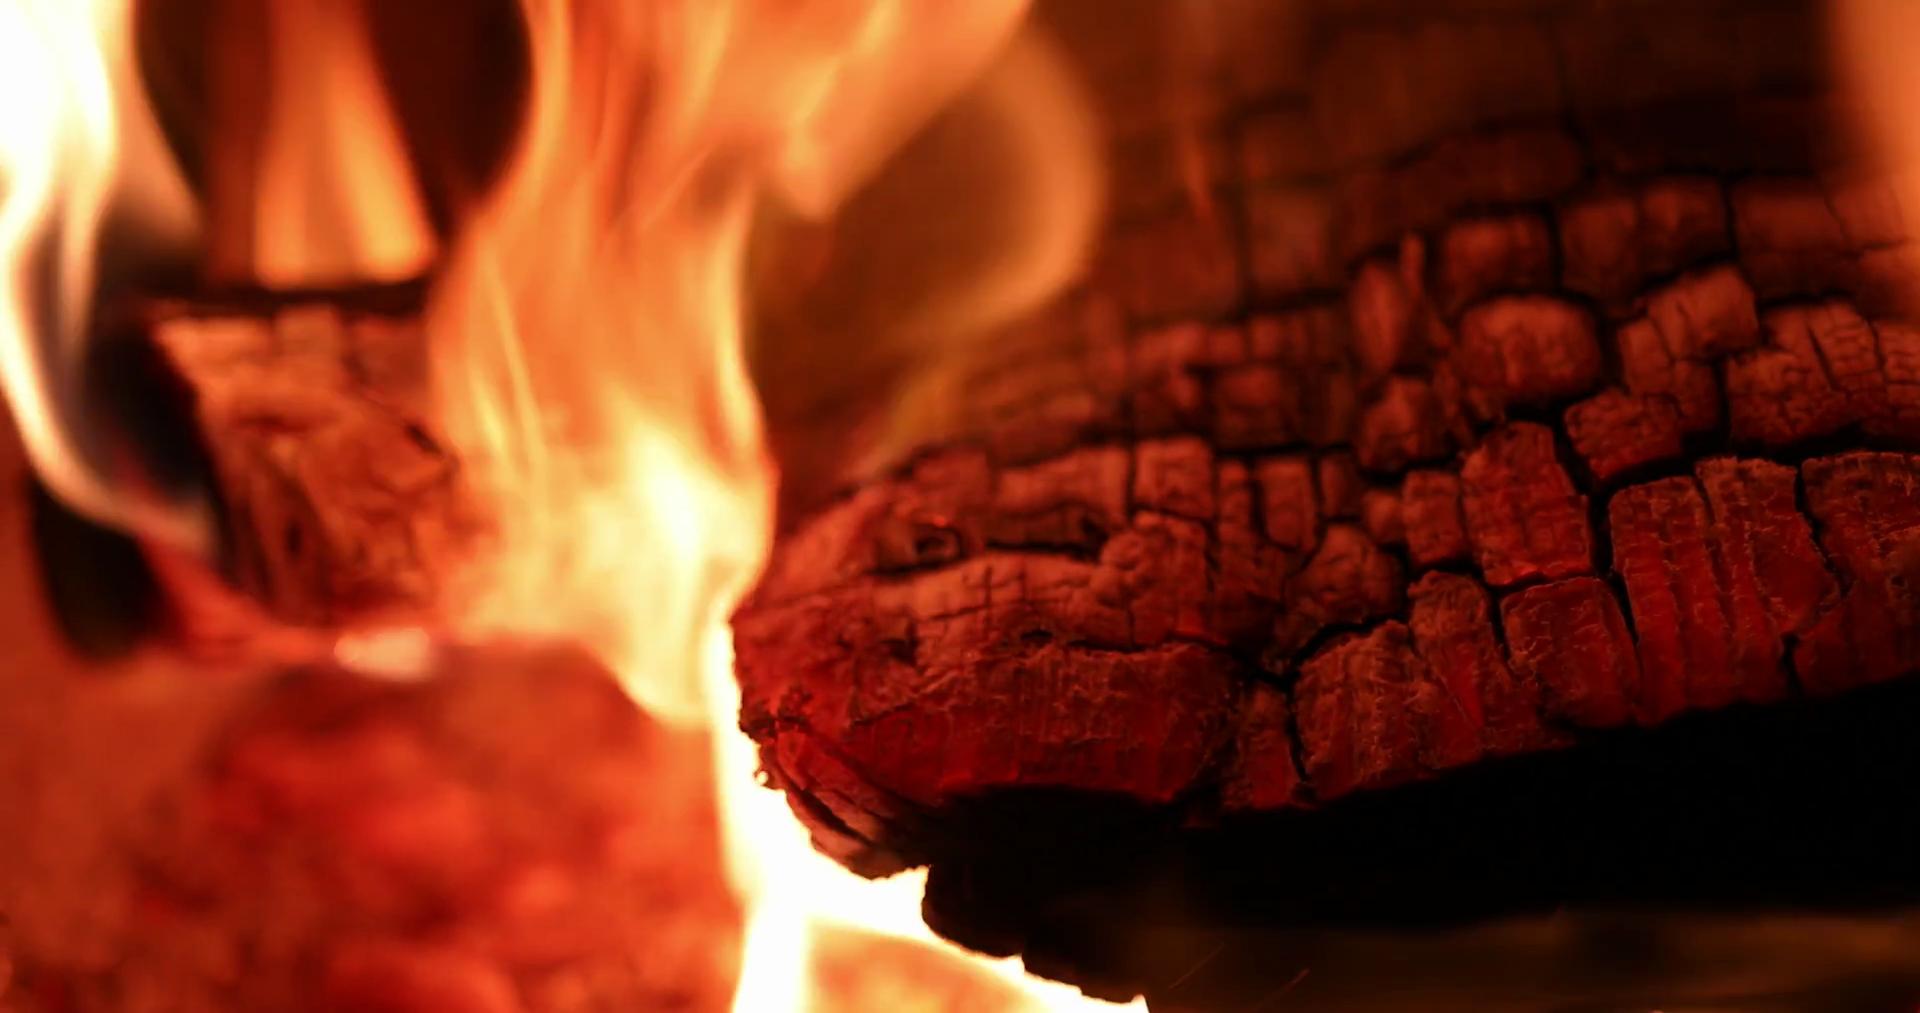 4K Fireplace Burning Wood Fire Hot Stove Macro Slider Shot - Burning Wood PNG